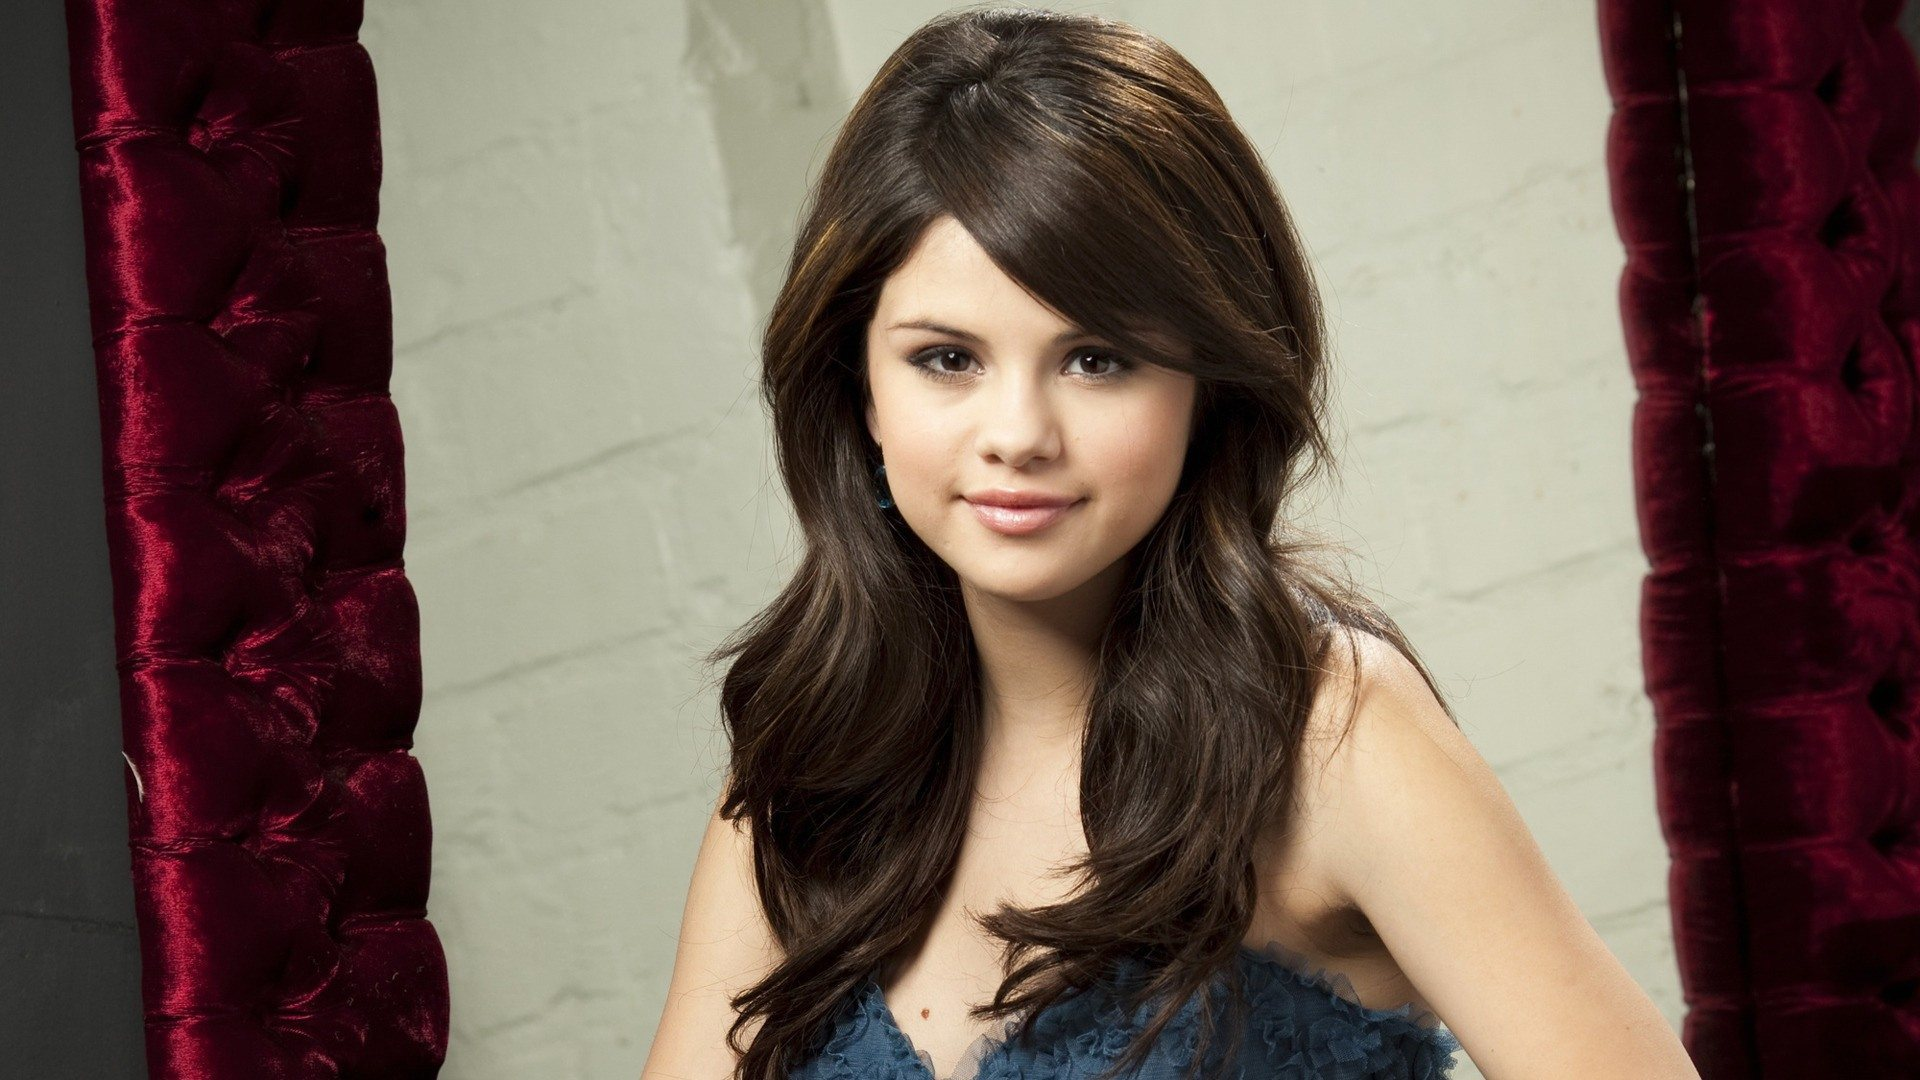 Selena Gomez Wallpapers HQ